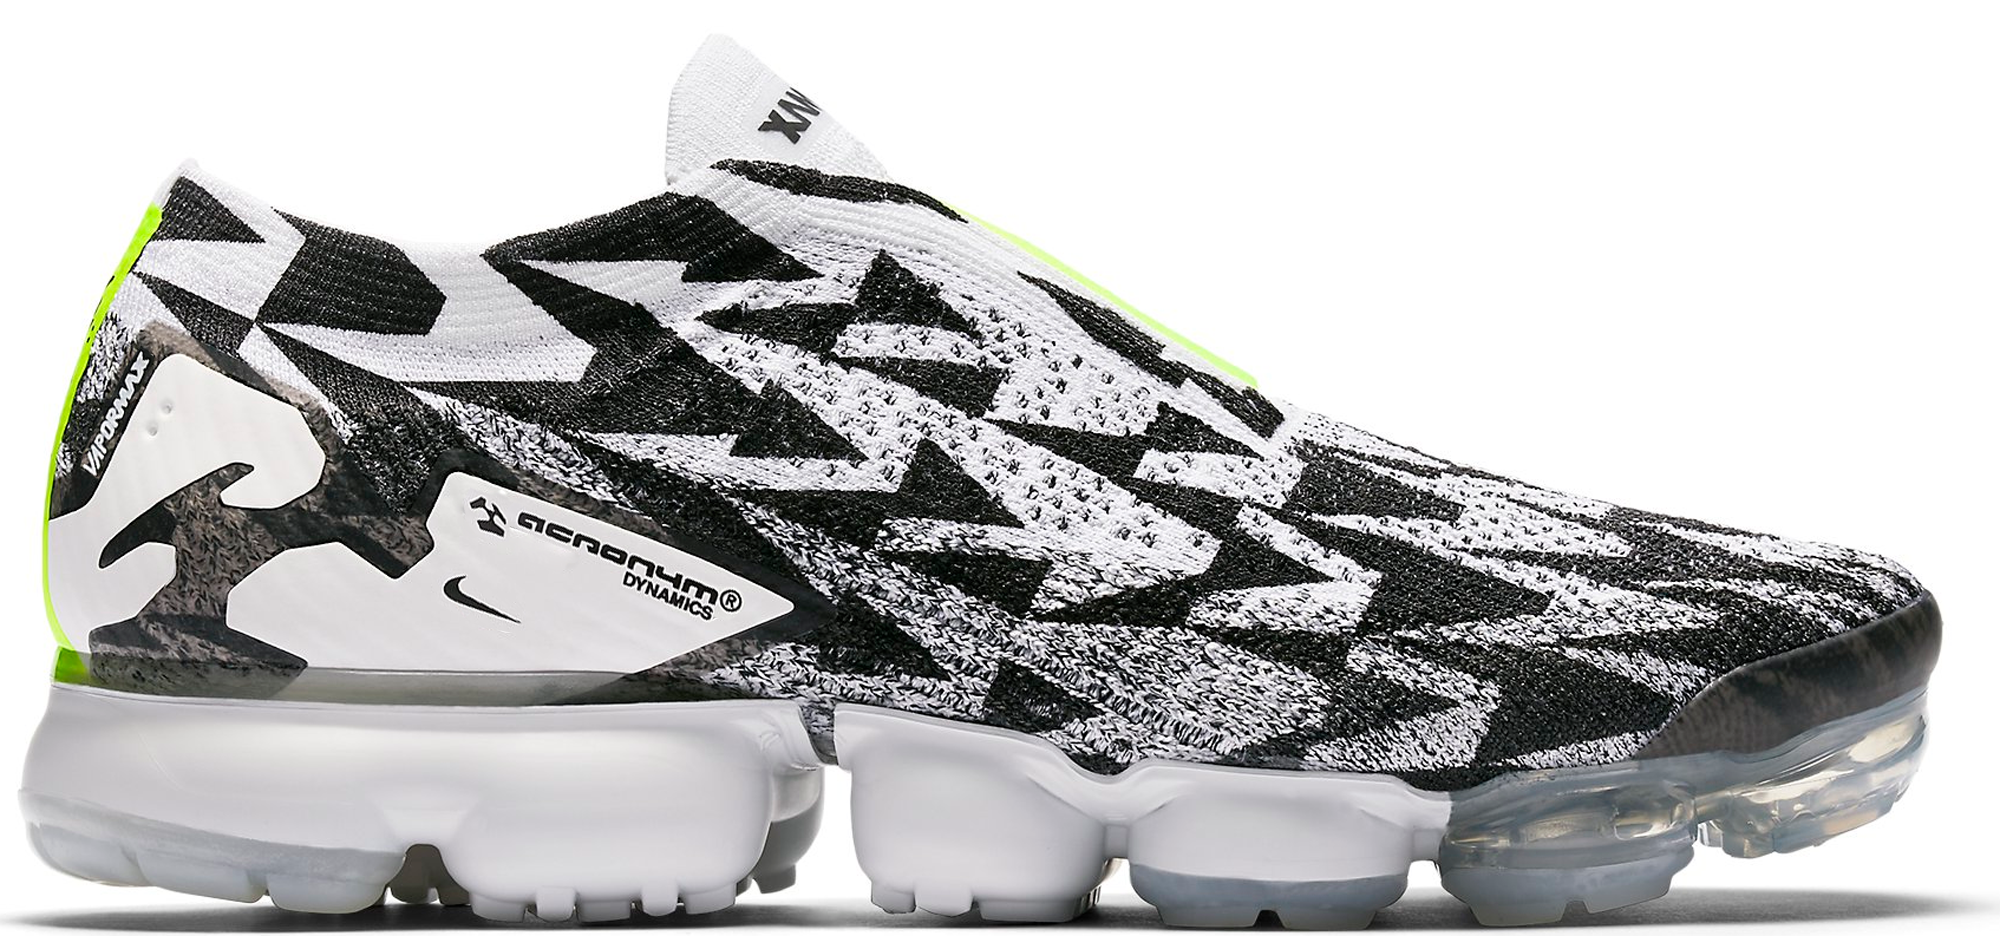 officiel de vente Acronyme X Nike Vapormax Moc 2 X Stock sortie 2014 unisexe yBN3kJF2y6